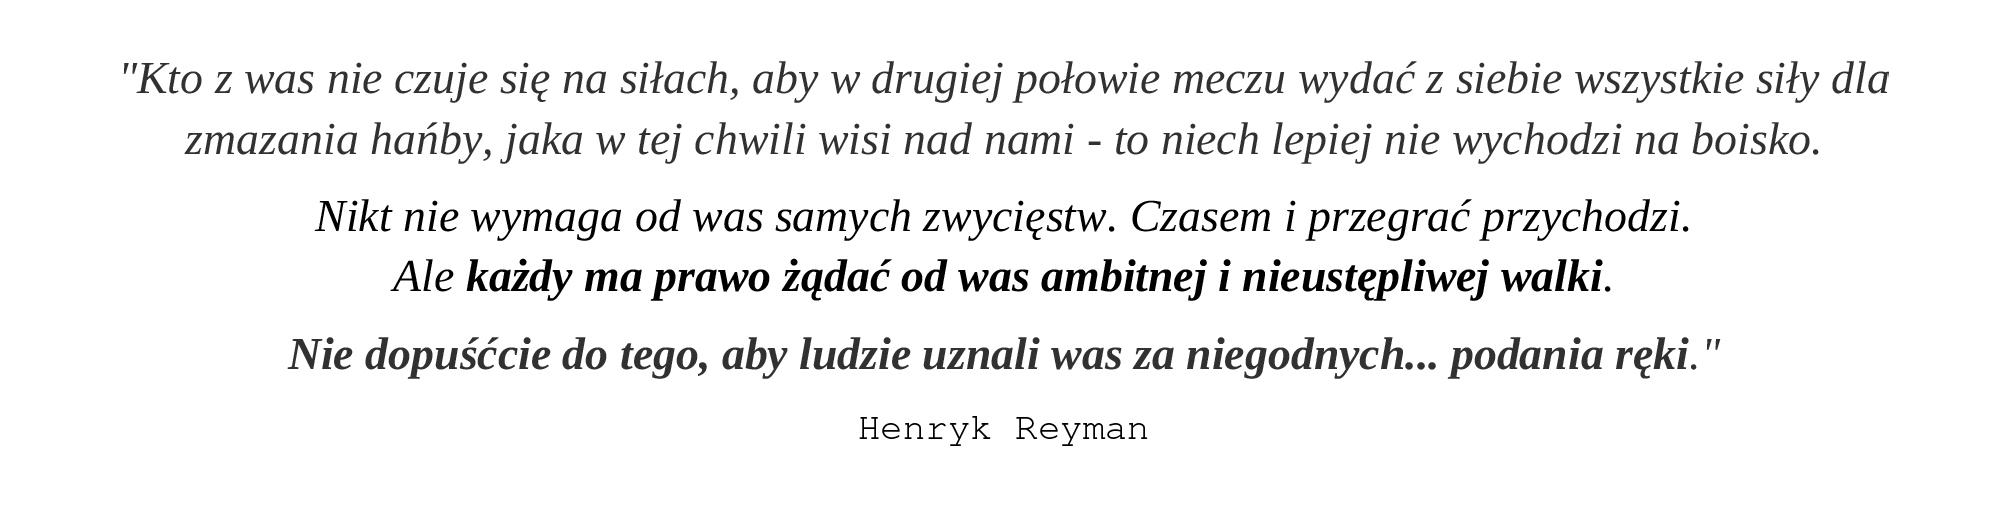 Henryk Reyman